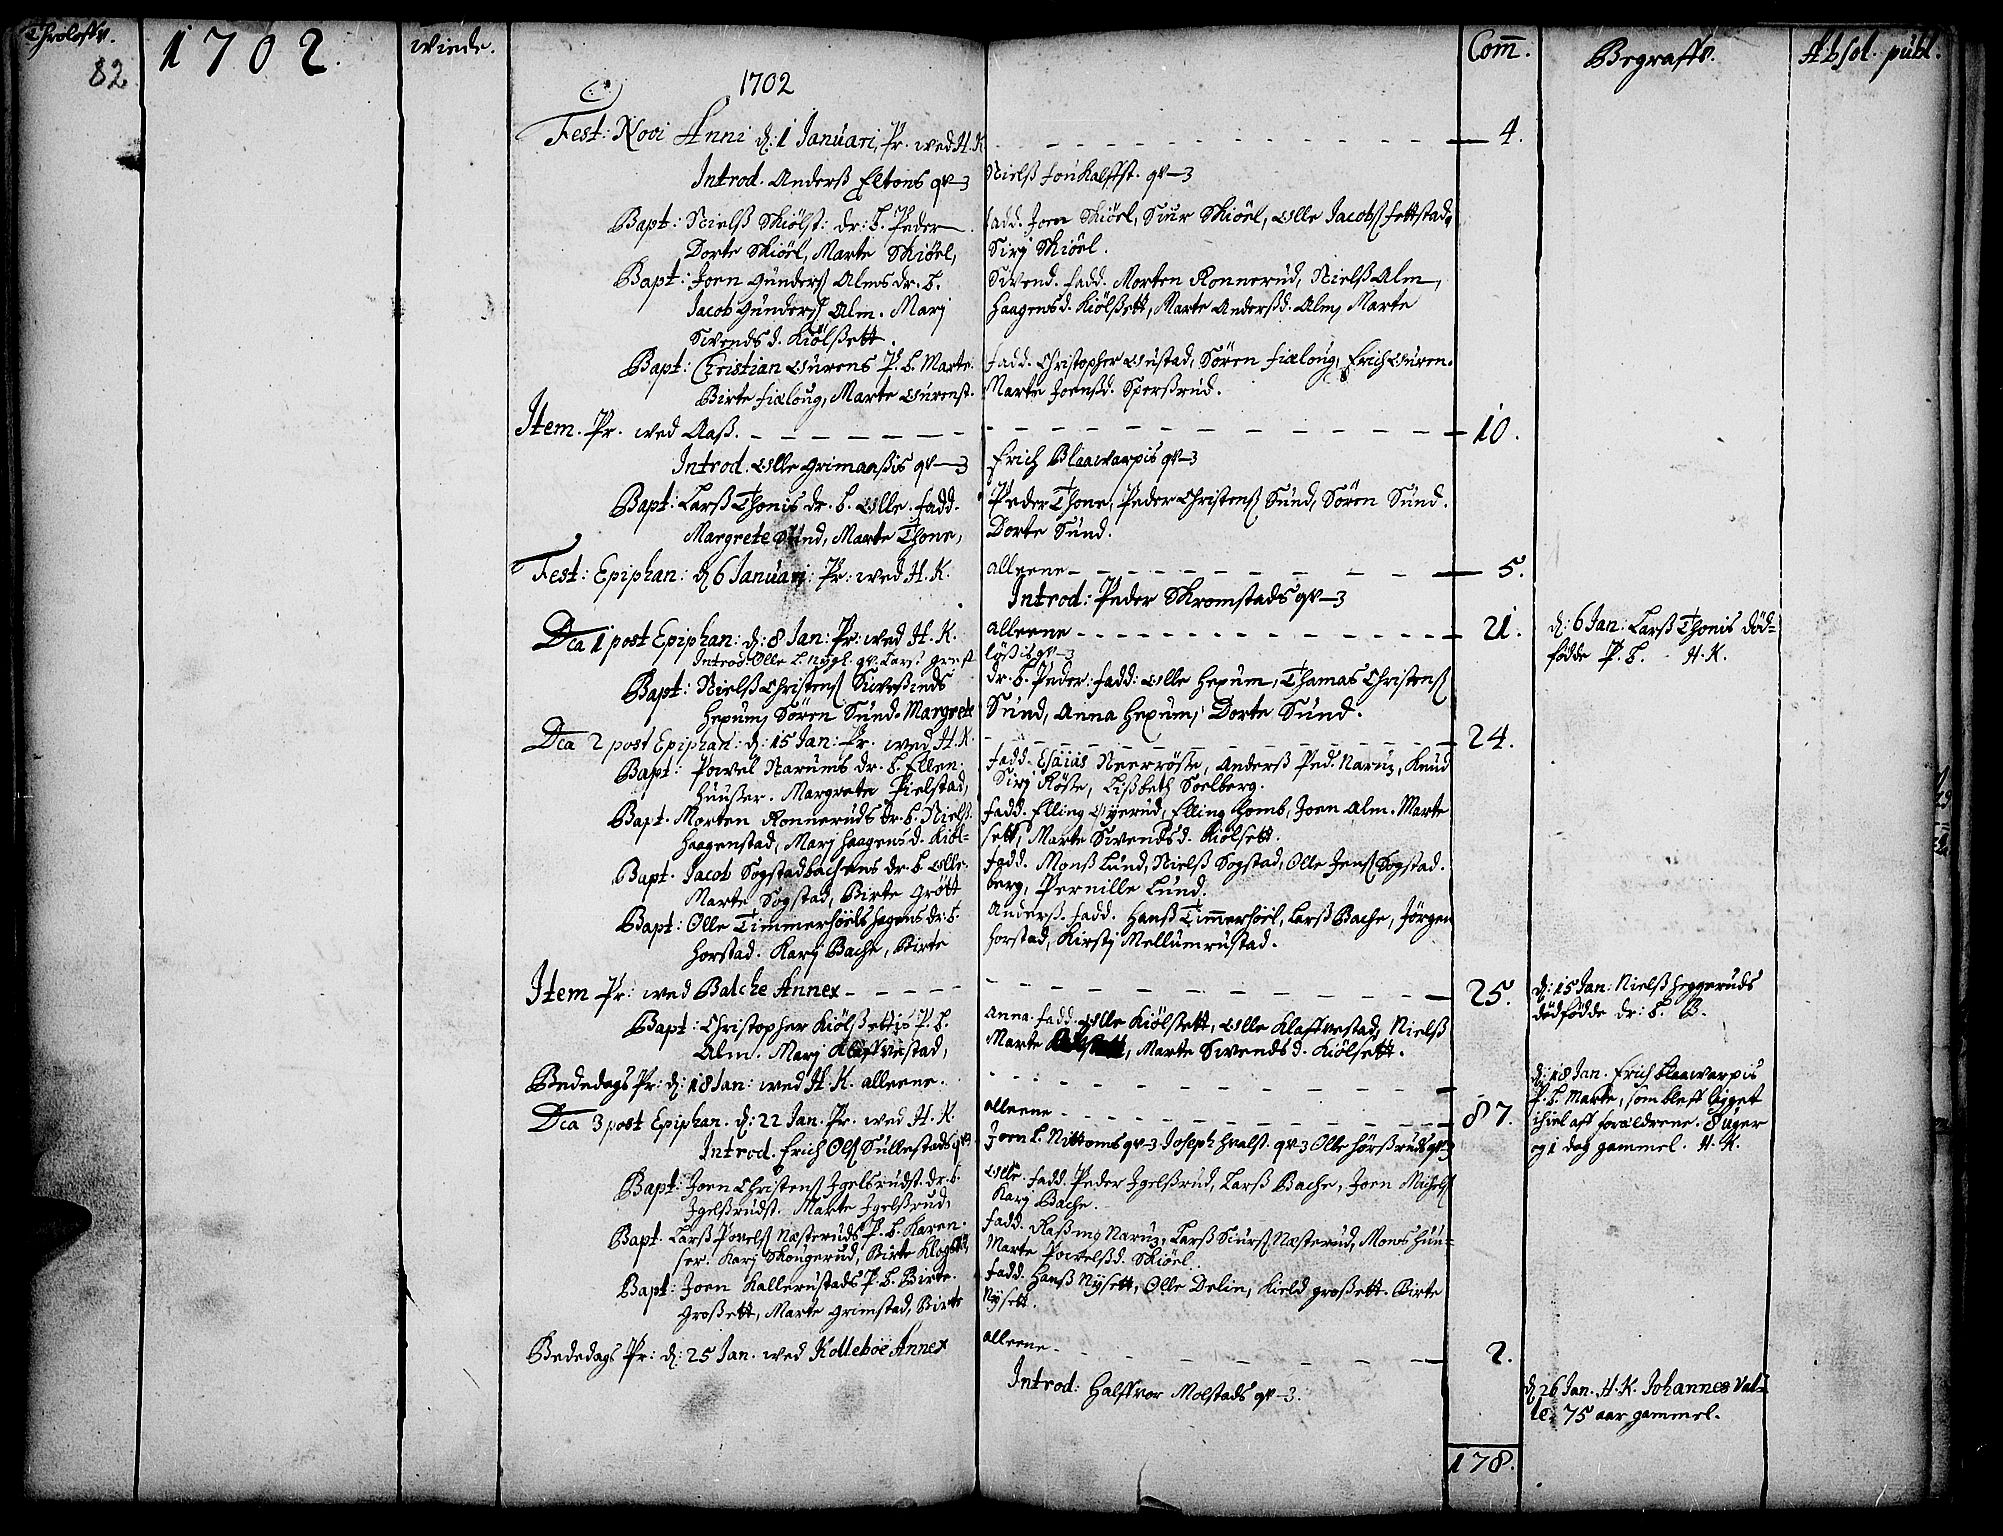 SAH, Toten prestekontor, Ministerialbok nr. 1, 1695-1713, s. 82